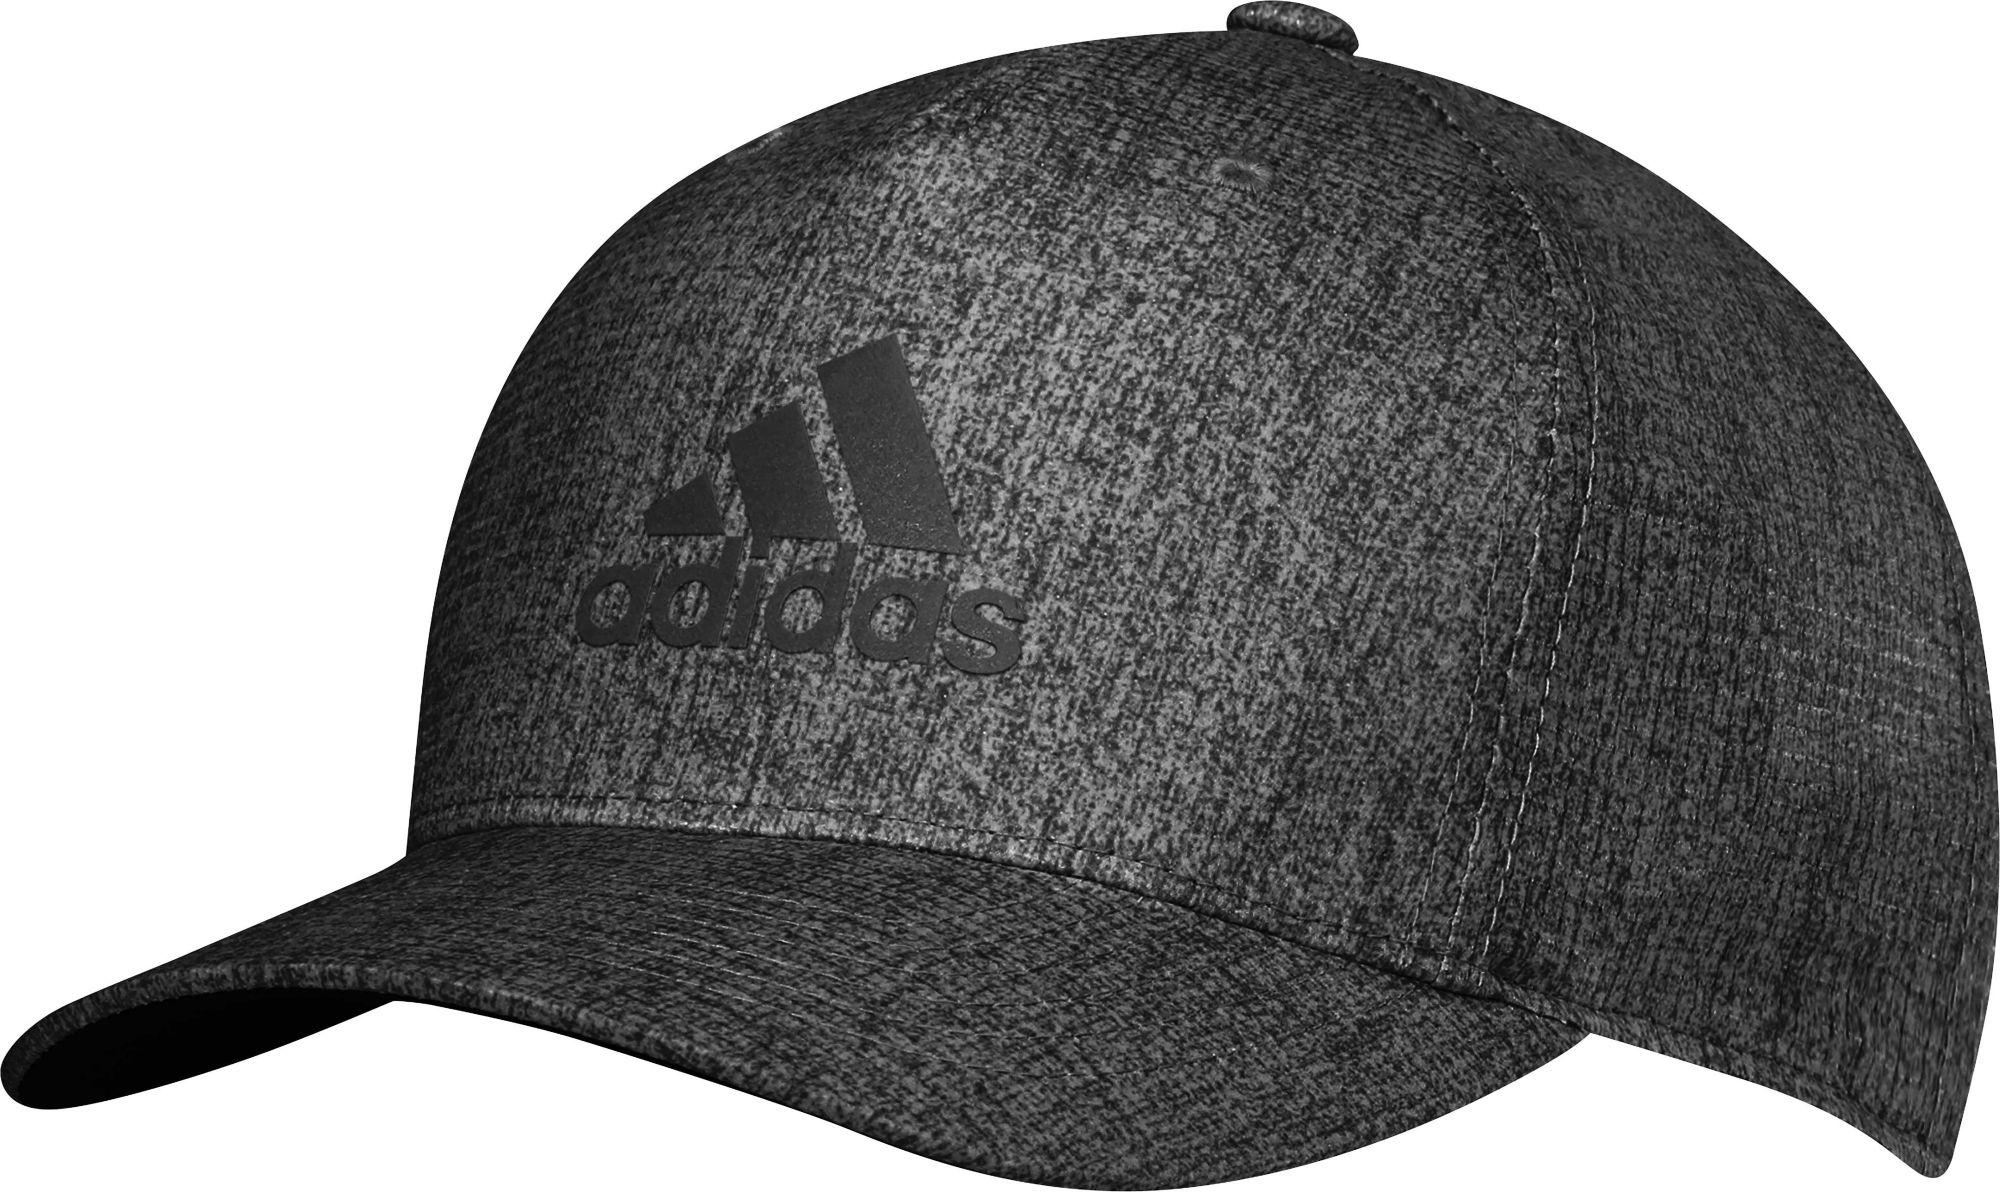 Lyst - adidas Heathered Snapback Golf Hat in Black for Men e035b7d89ea5